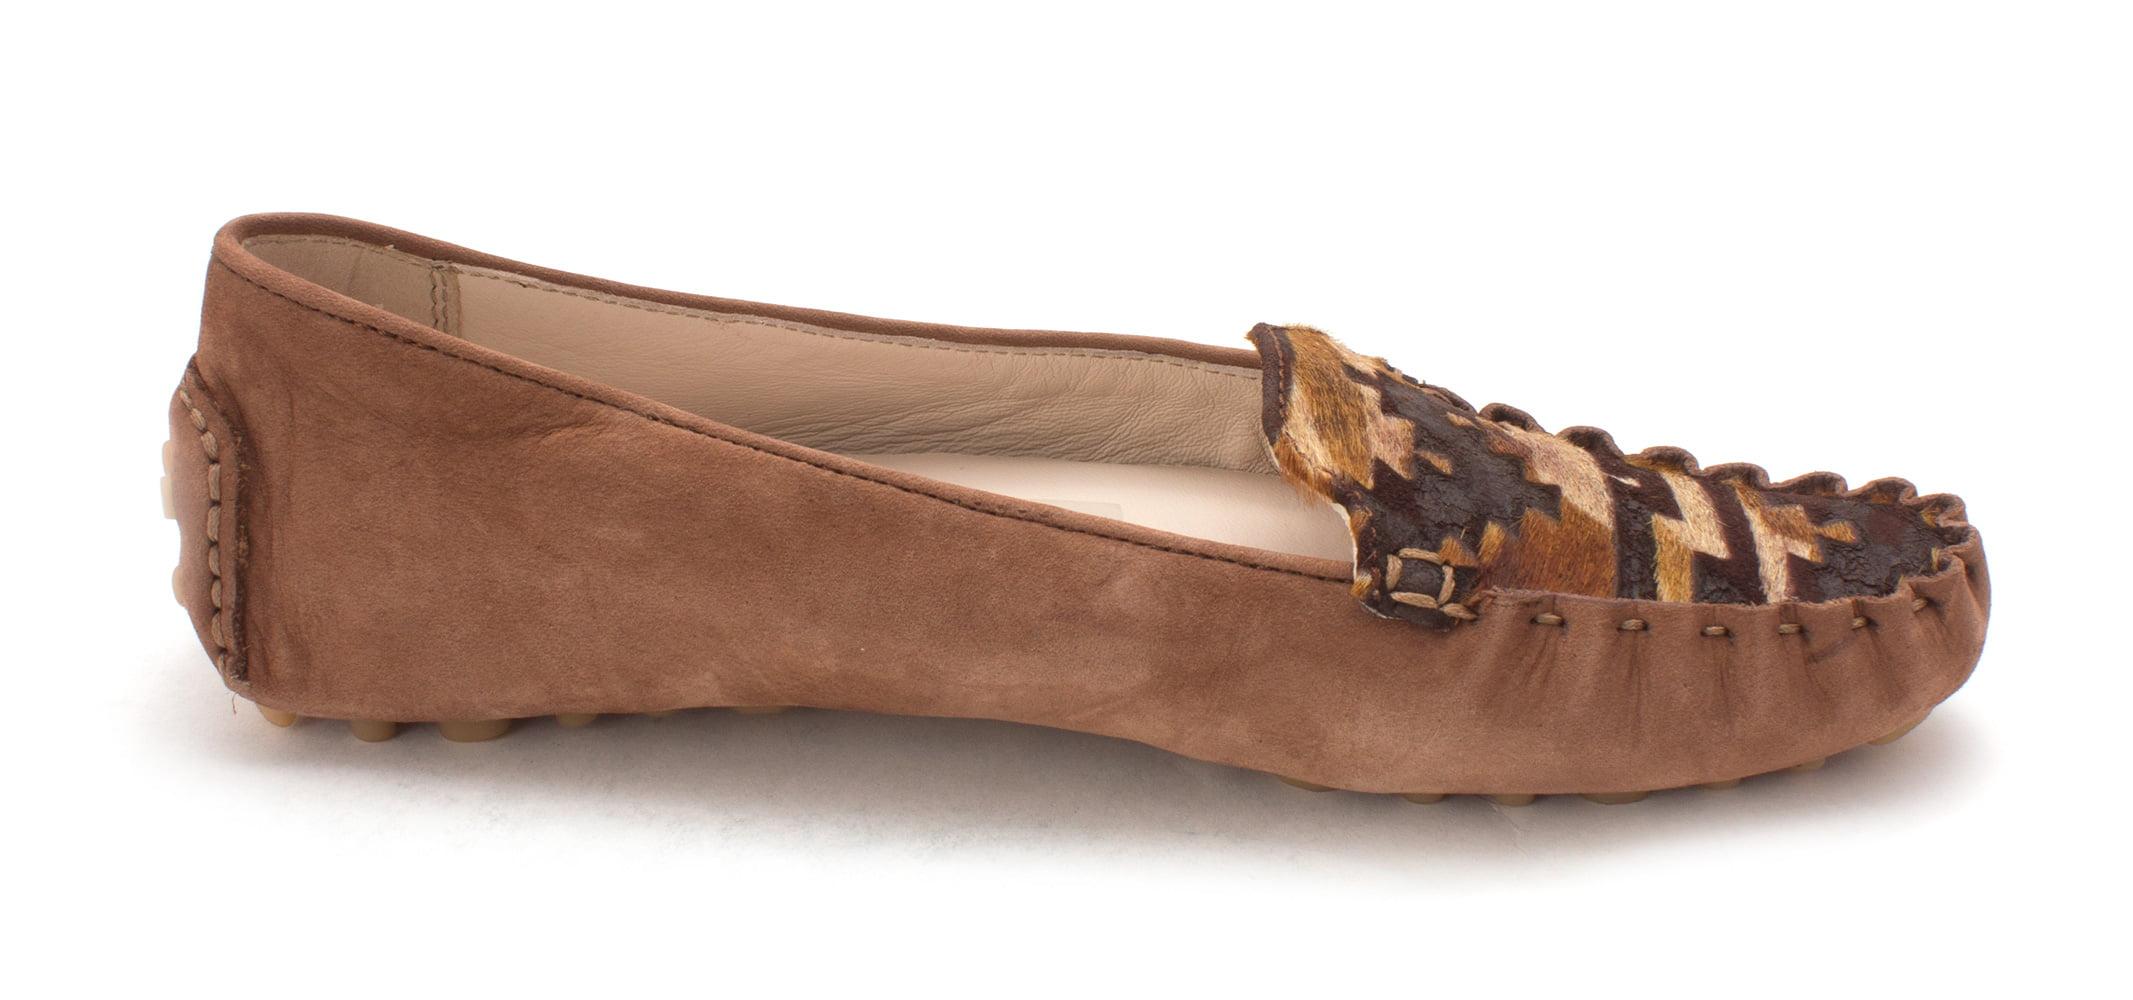 Cole Haan Womens Elishiasam Calf Hair Closed Toe, Brown Multi, Size 6.0